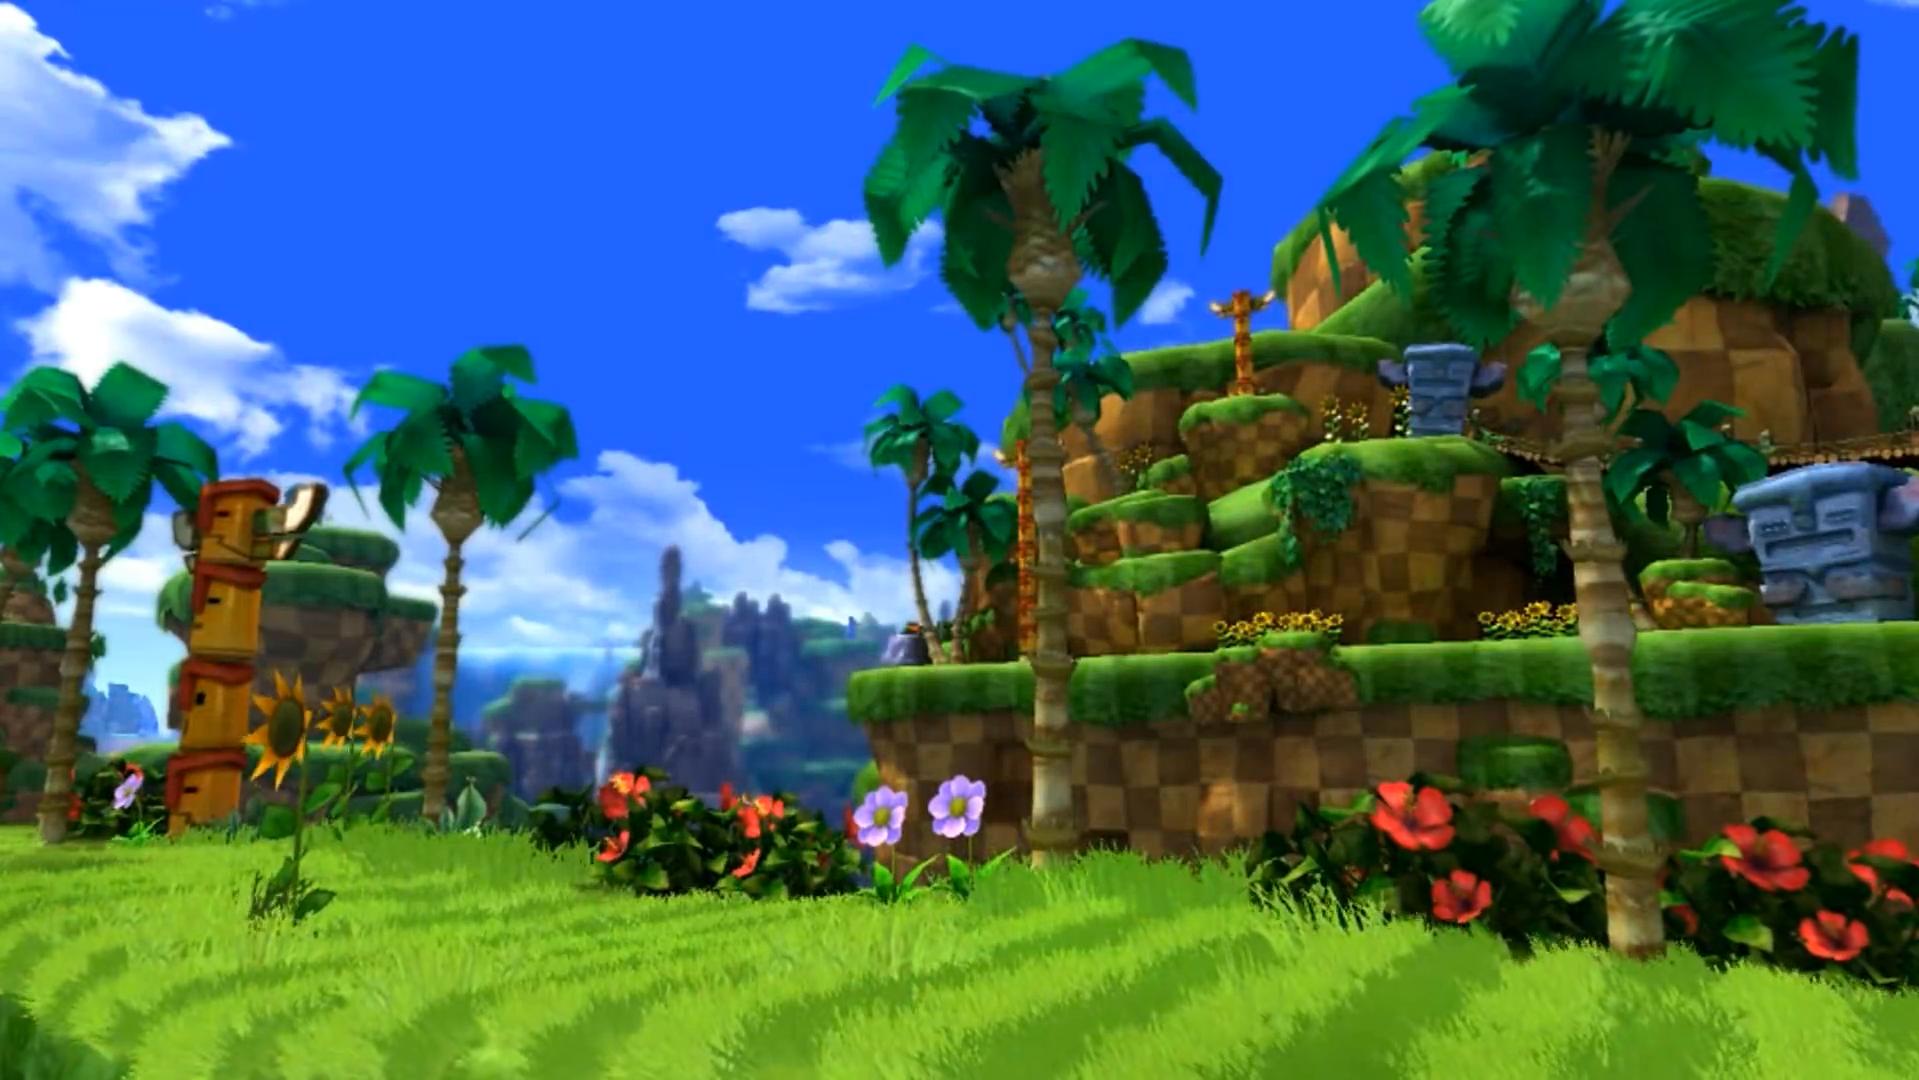 Green Hill Zone (Classic Sonic's world)